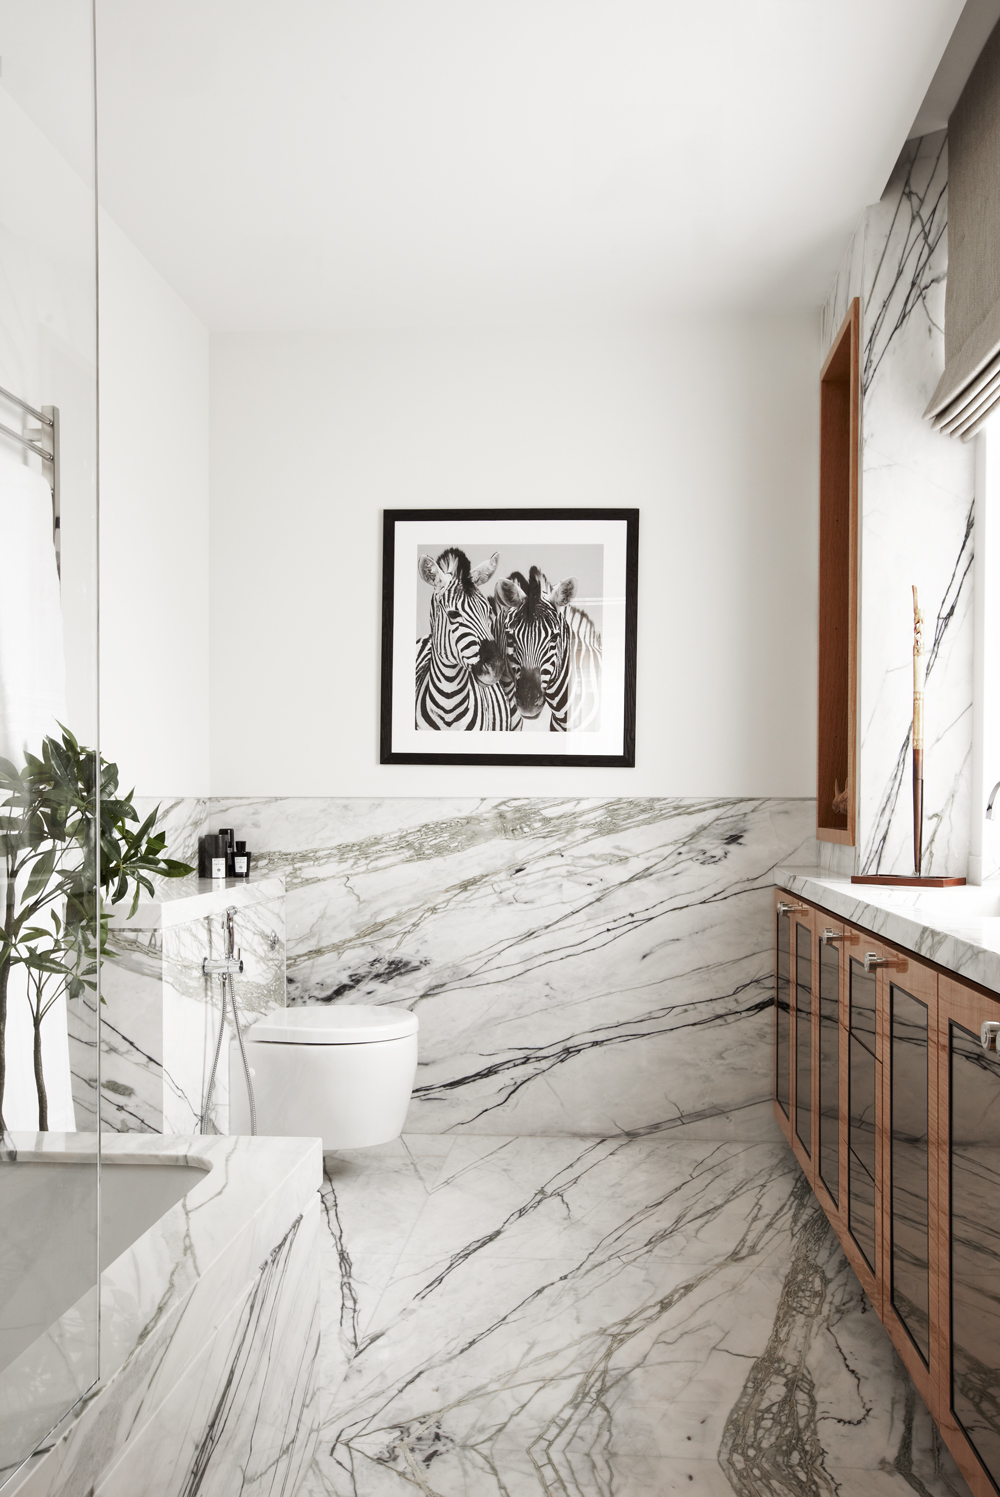 30-Marble-Bathroom-Design-Ideas-5.jpg